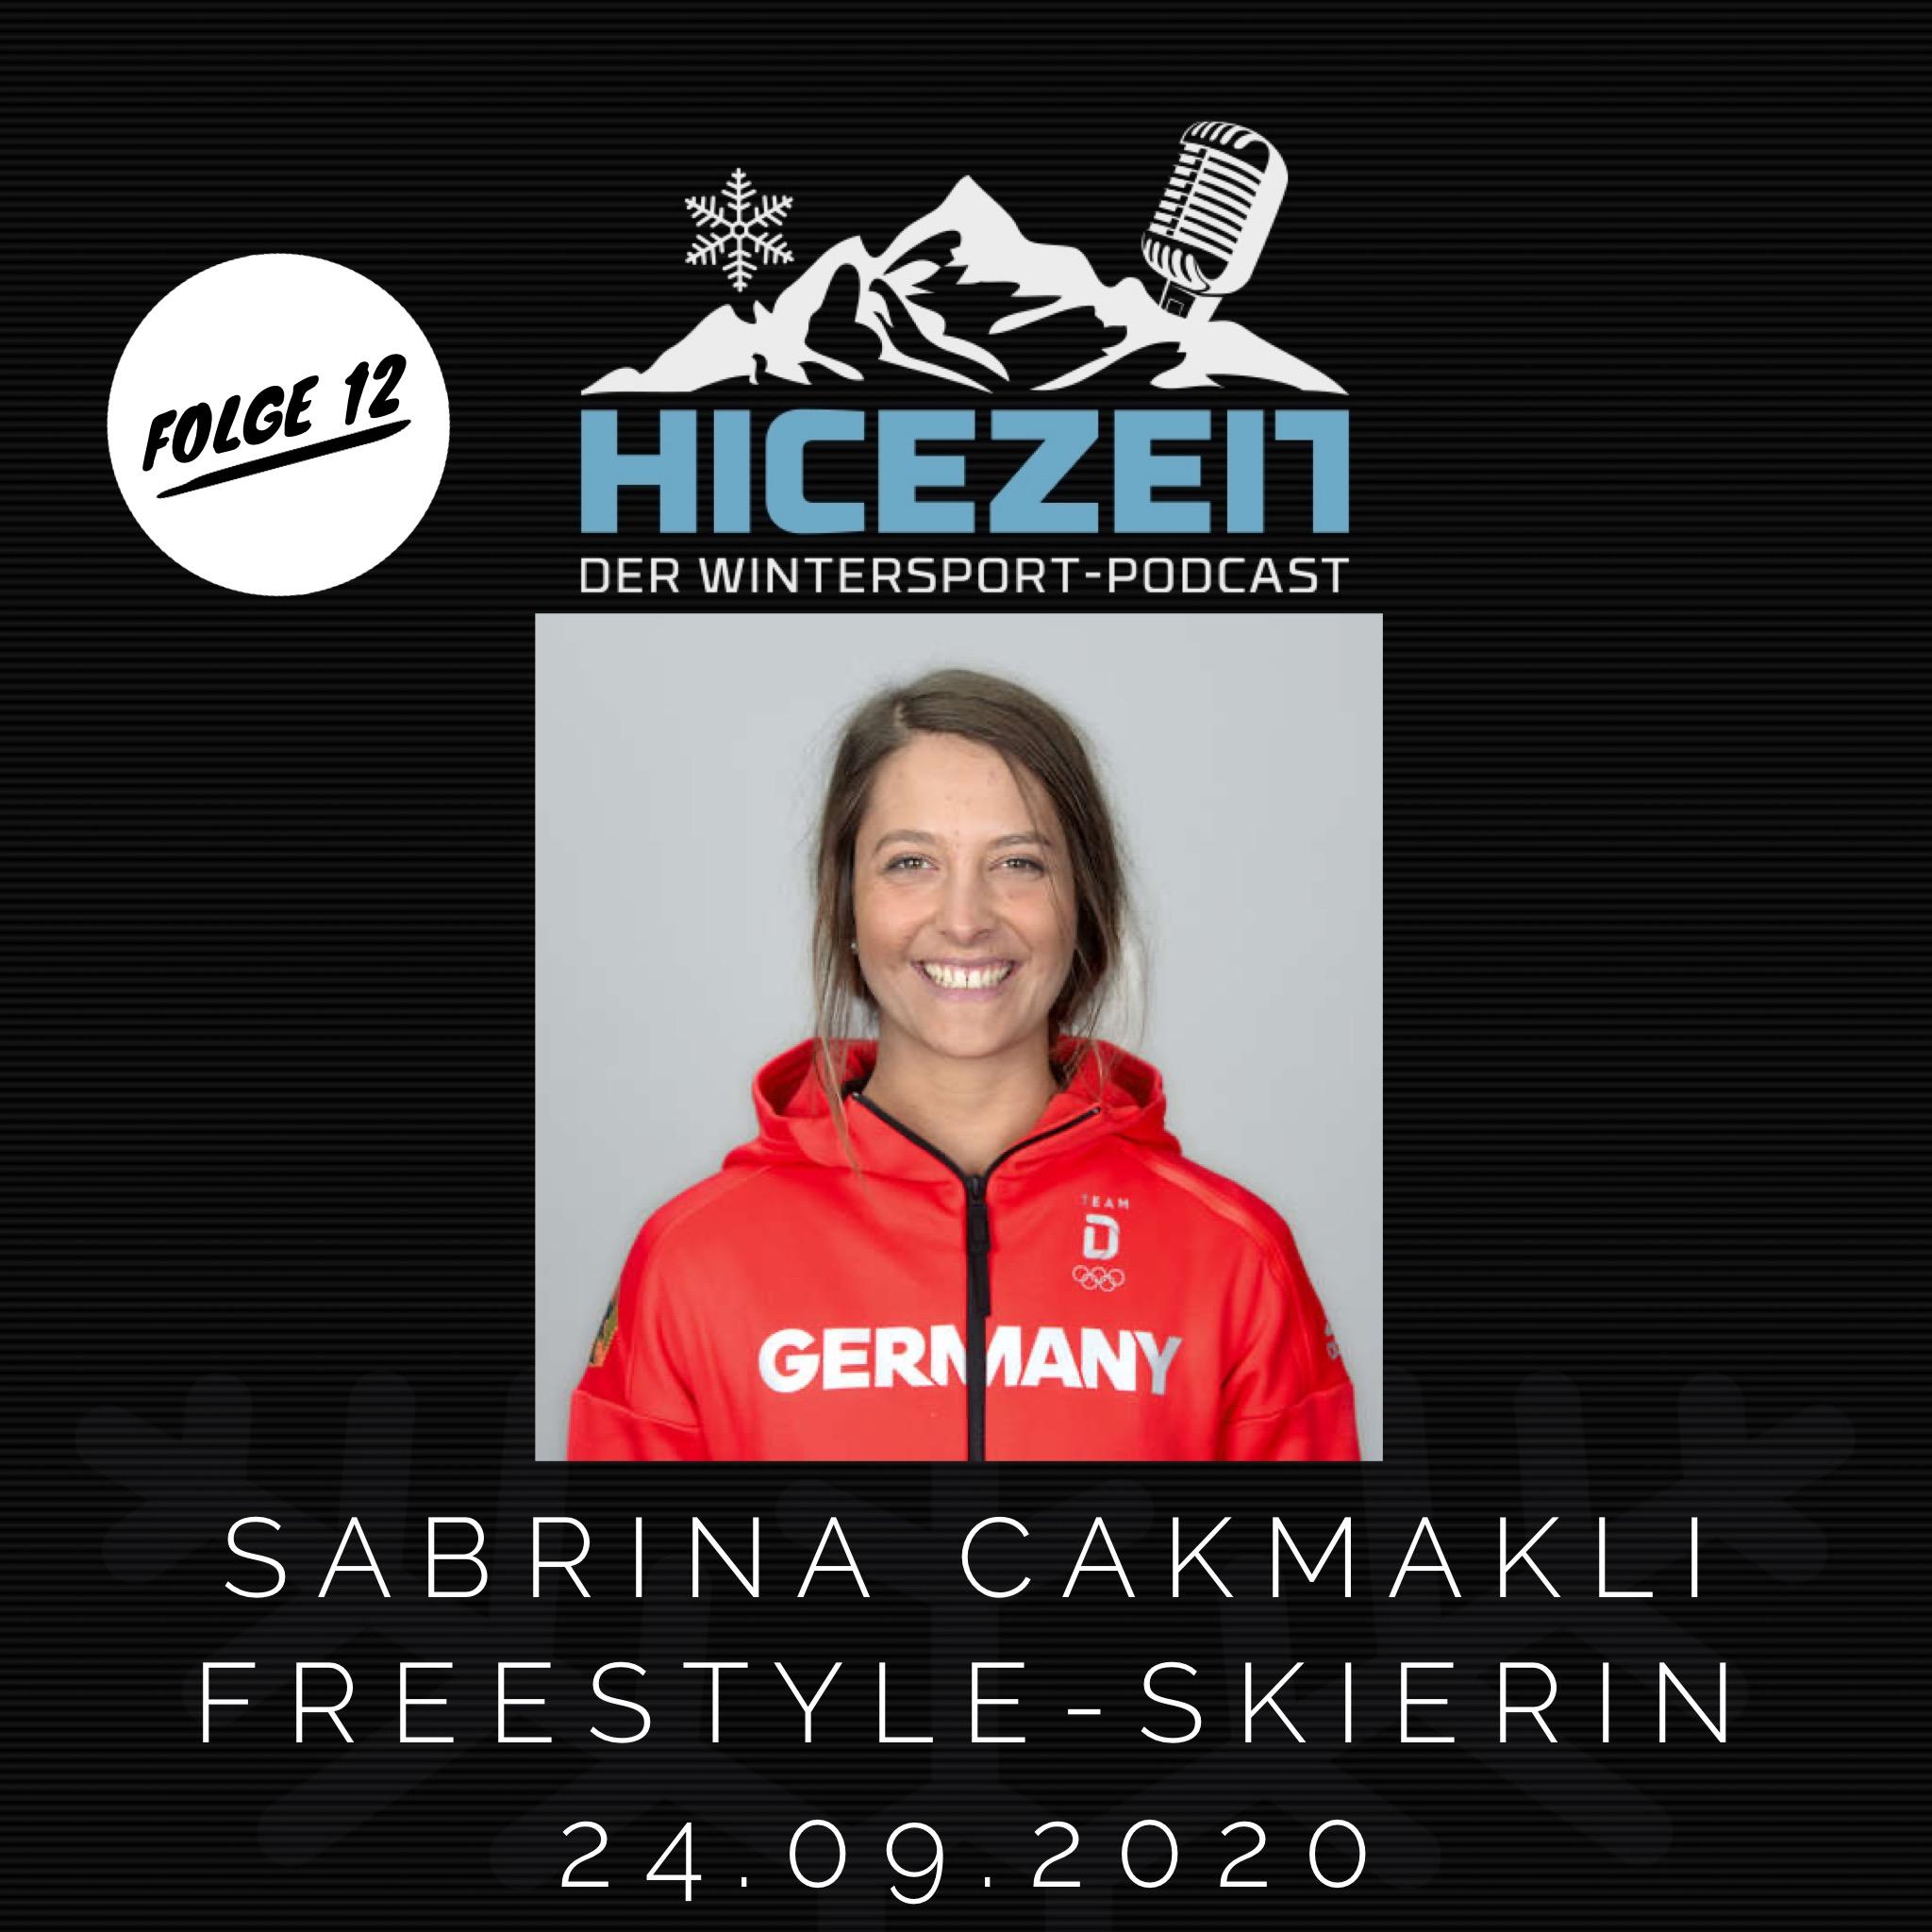 Sabrina Cakmakli, Freestyle-Skierin, Der Wintersport-Podcast Folge 12